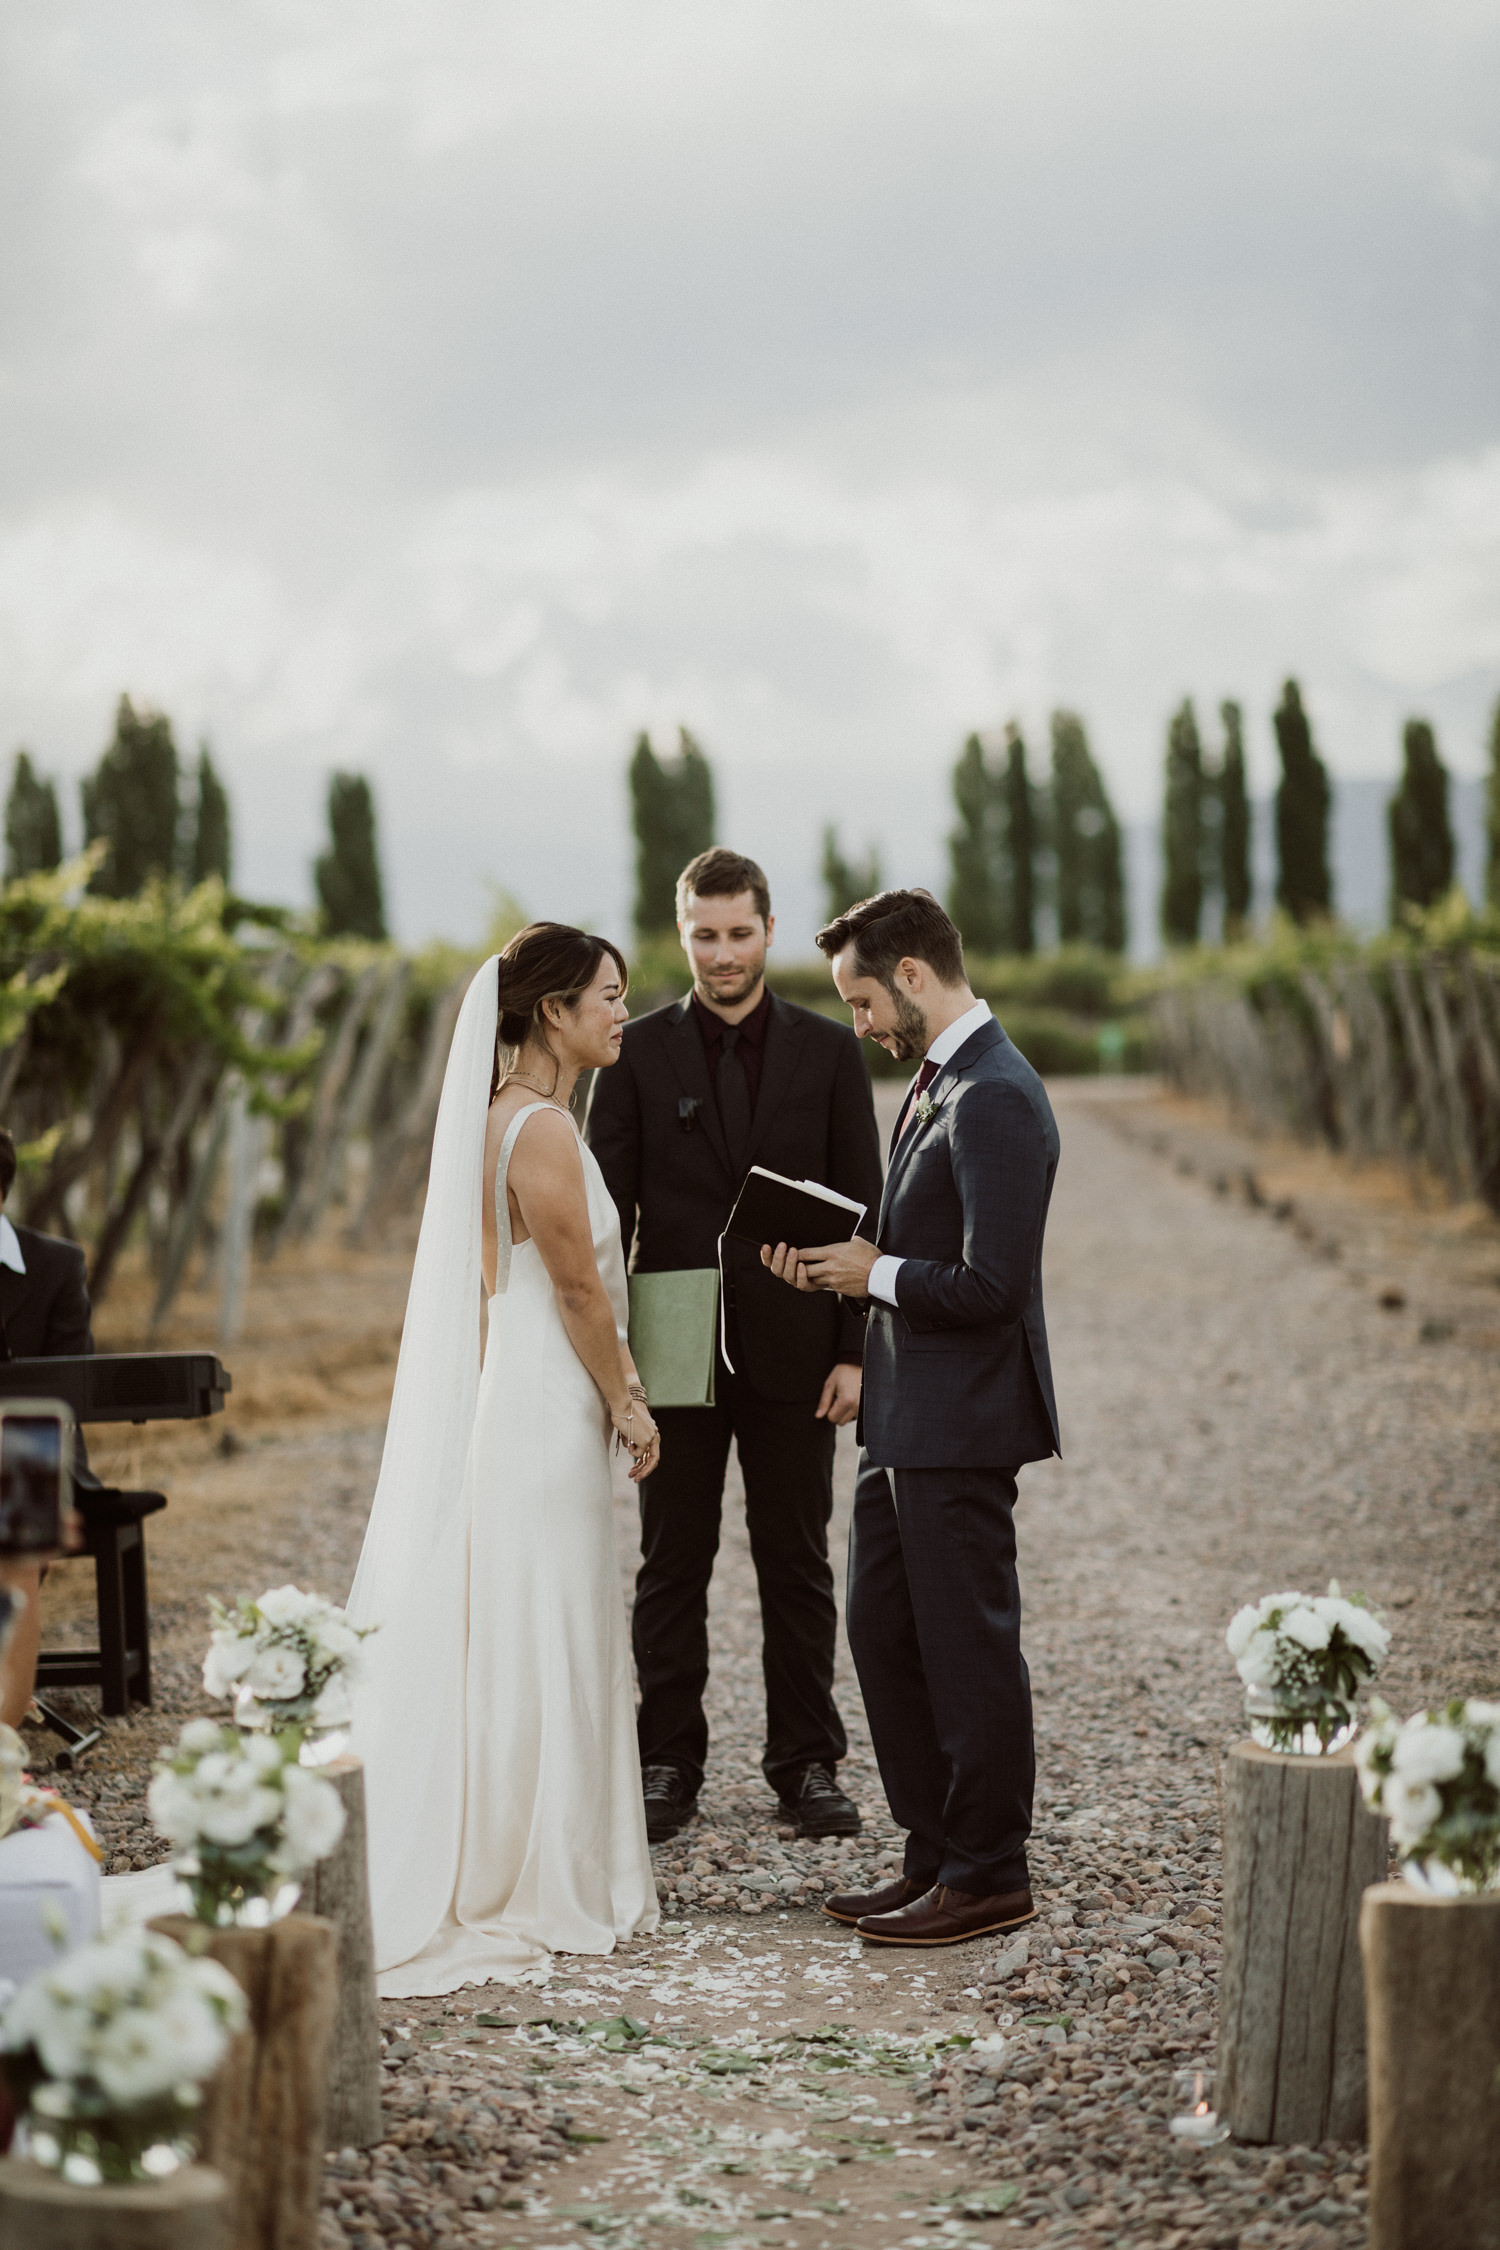 cedarandpines-kasey-erich-wedding-23.jpg